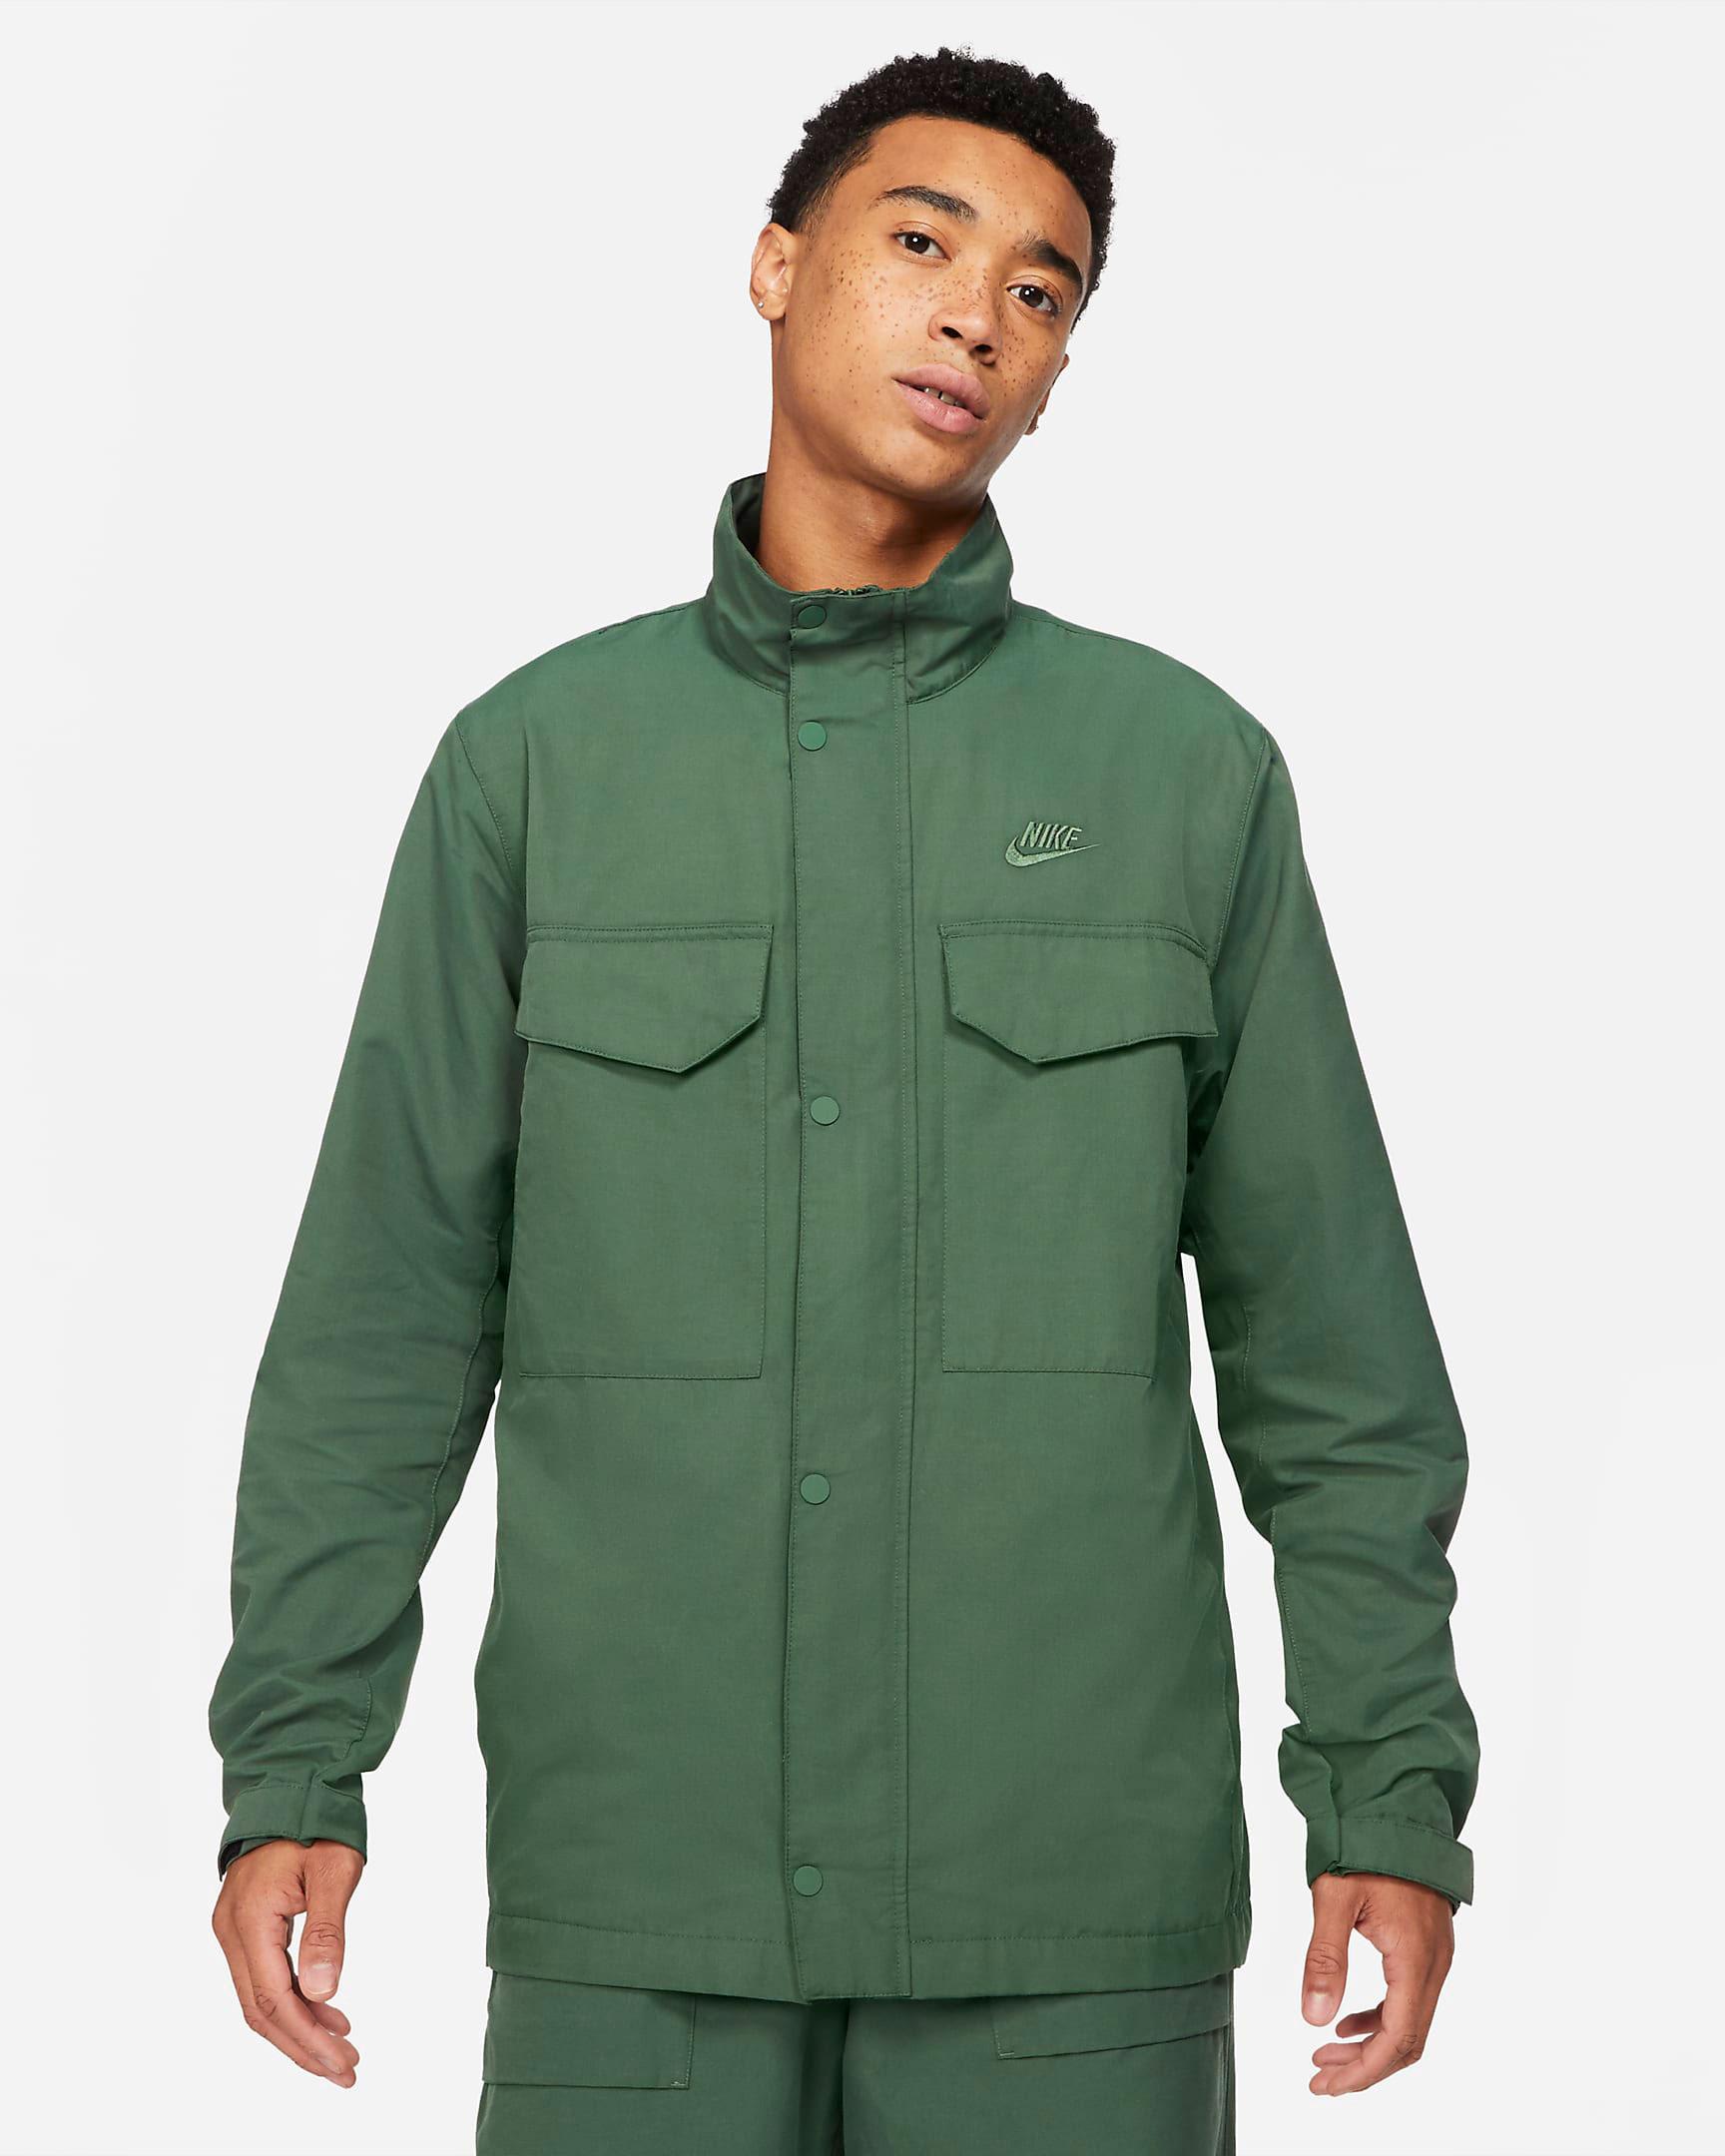 nike-galactic-jade-jacket